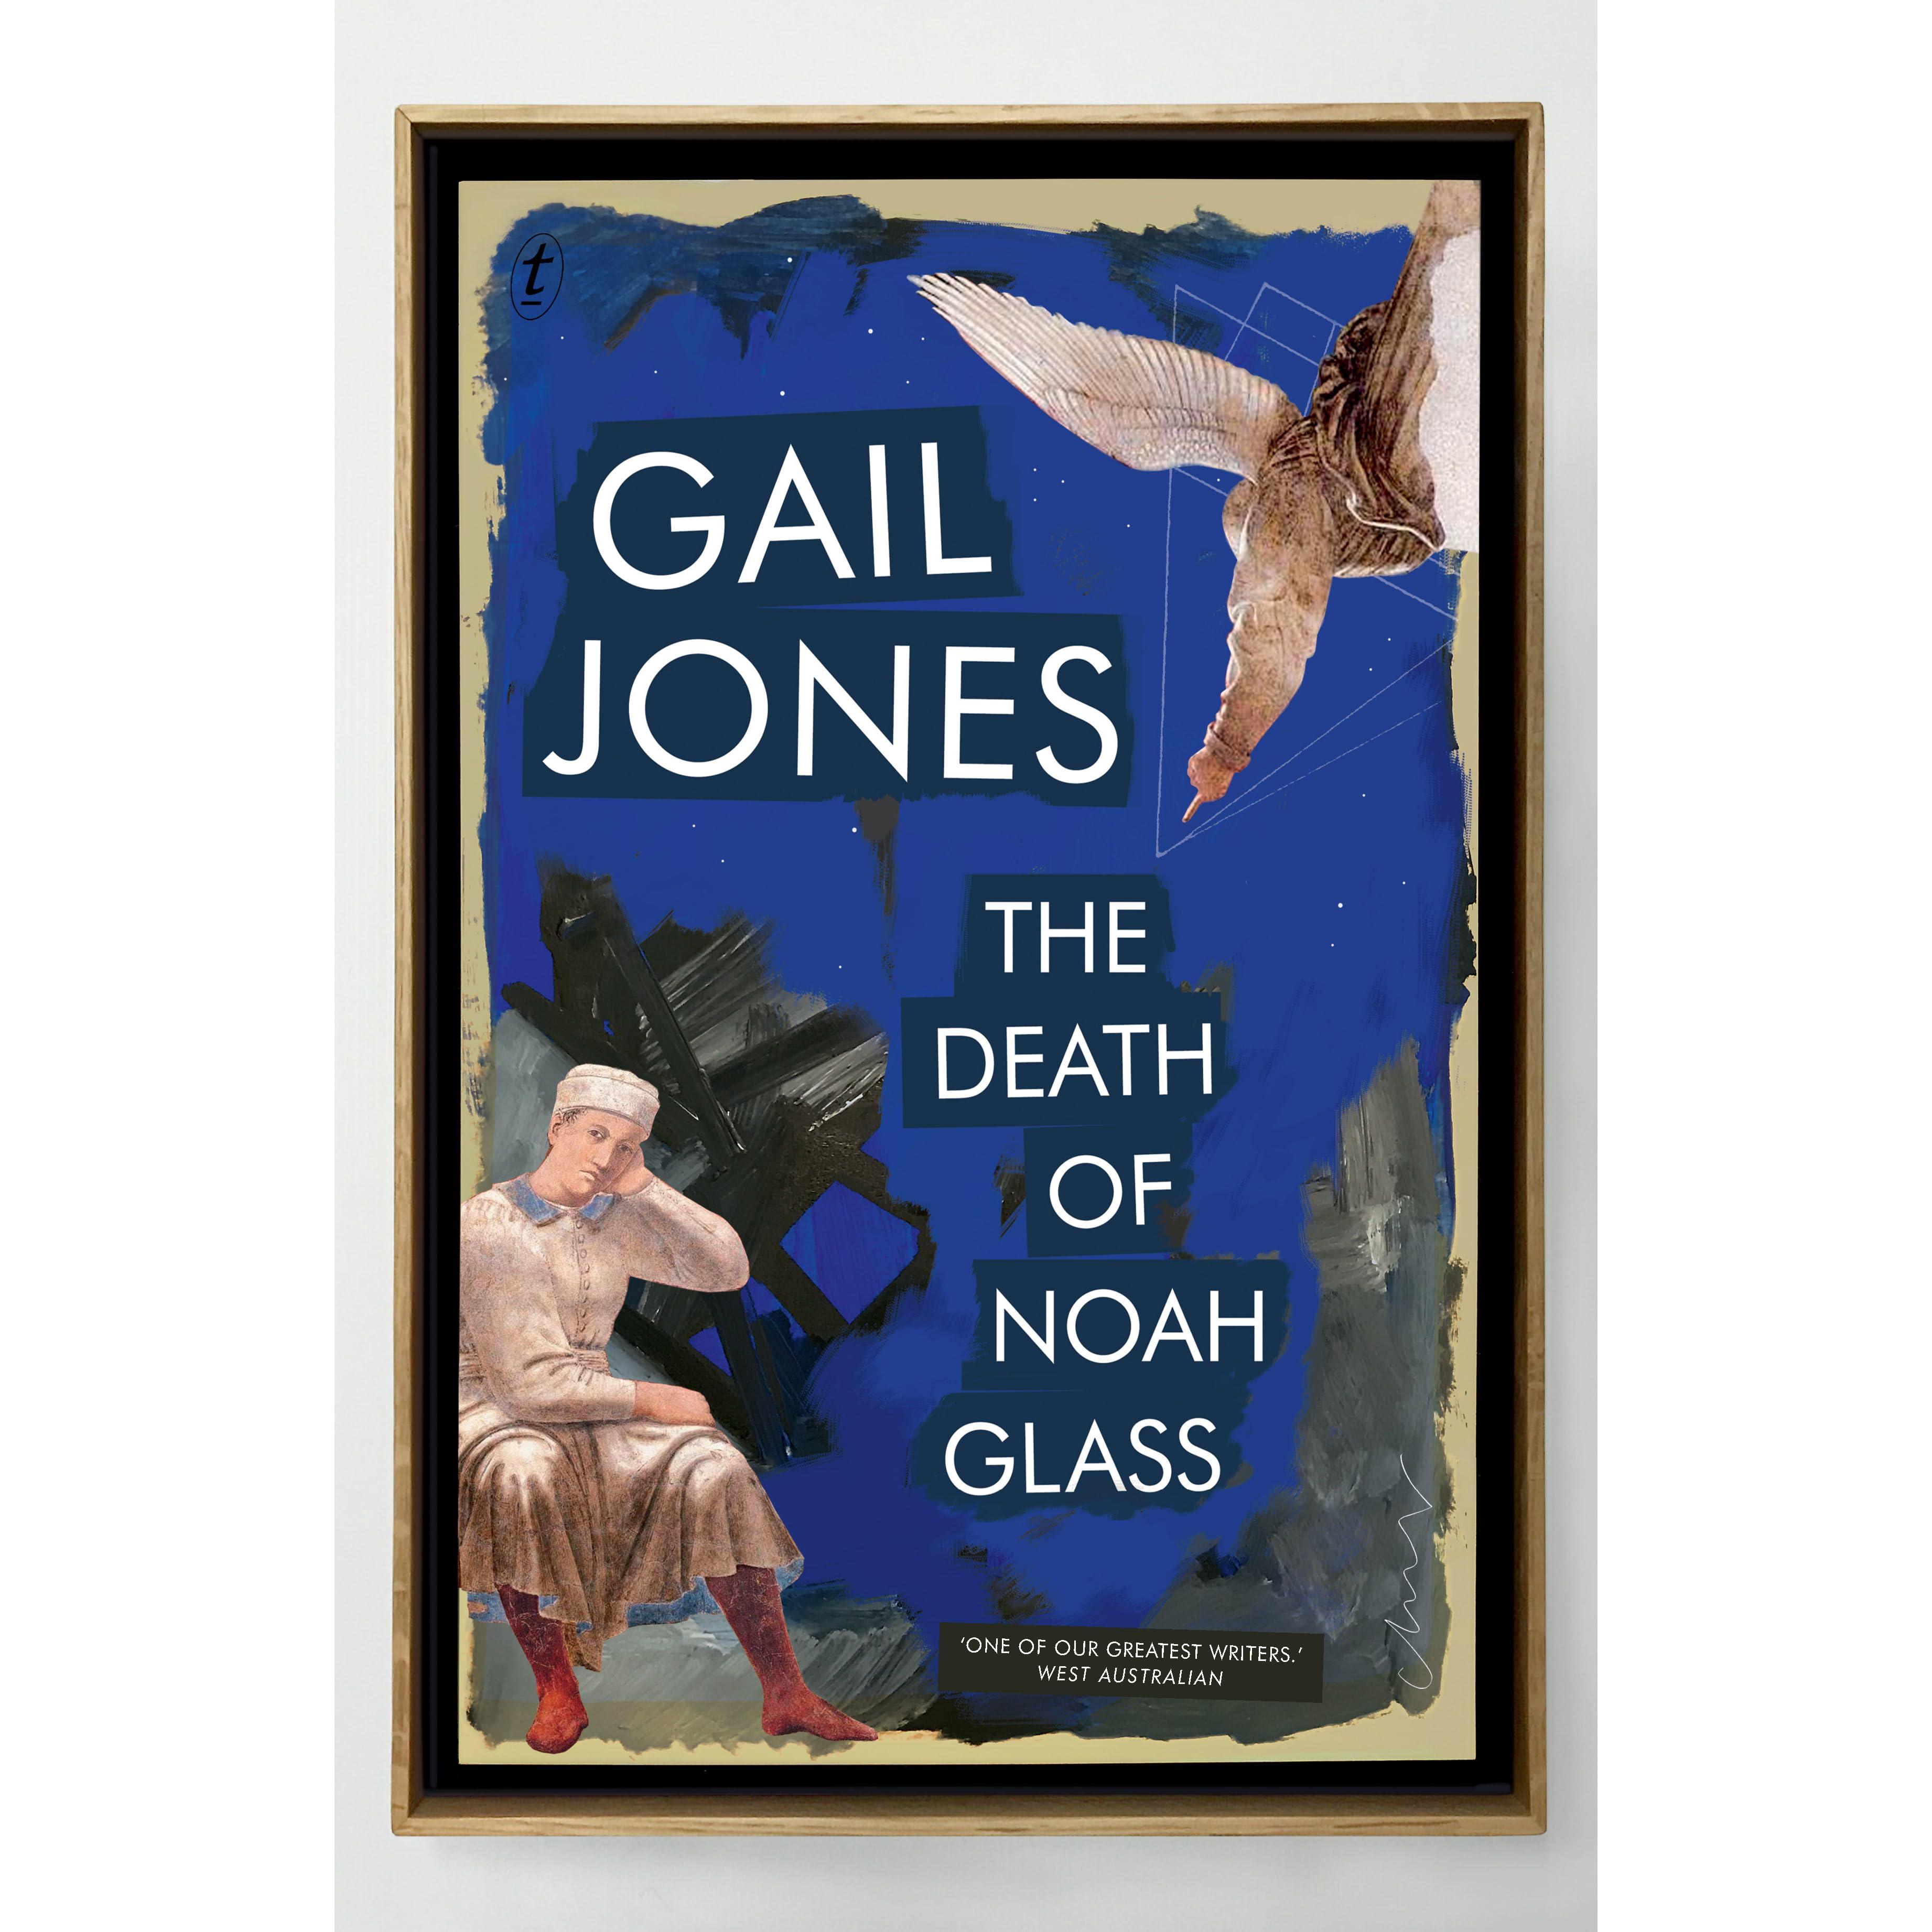 e18e8ced5ed4 The Death of Noah Glass by Gail Jones